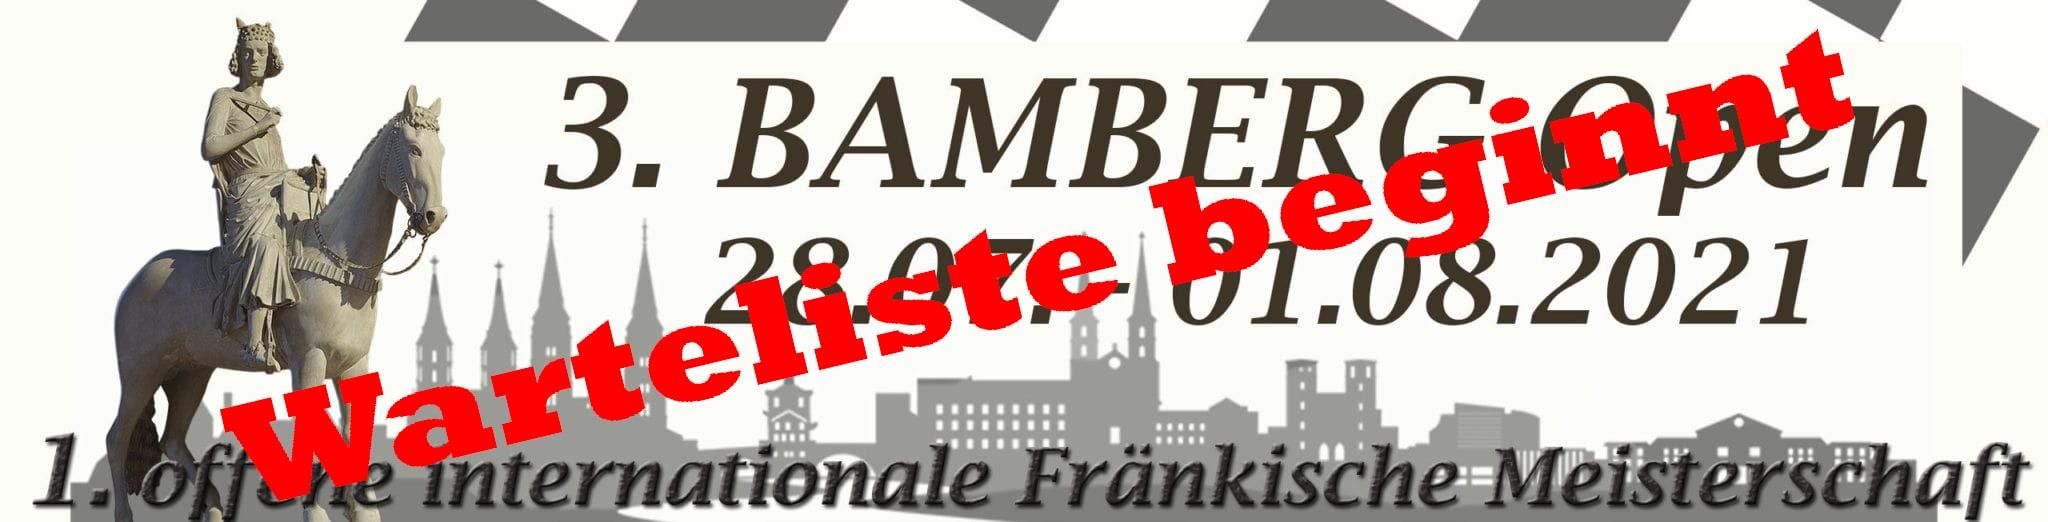 Bamberg Open 2021 - Warteliste